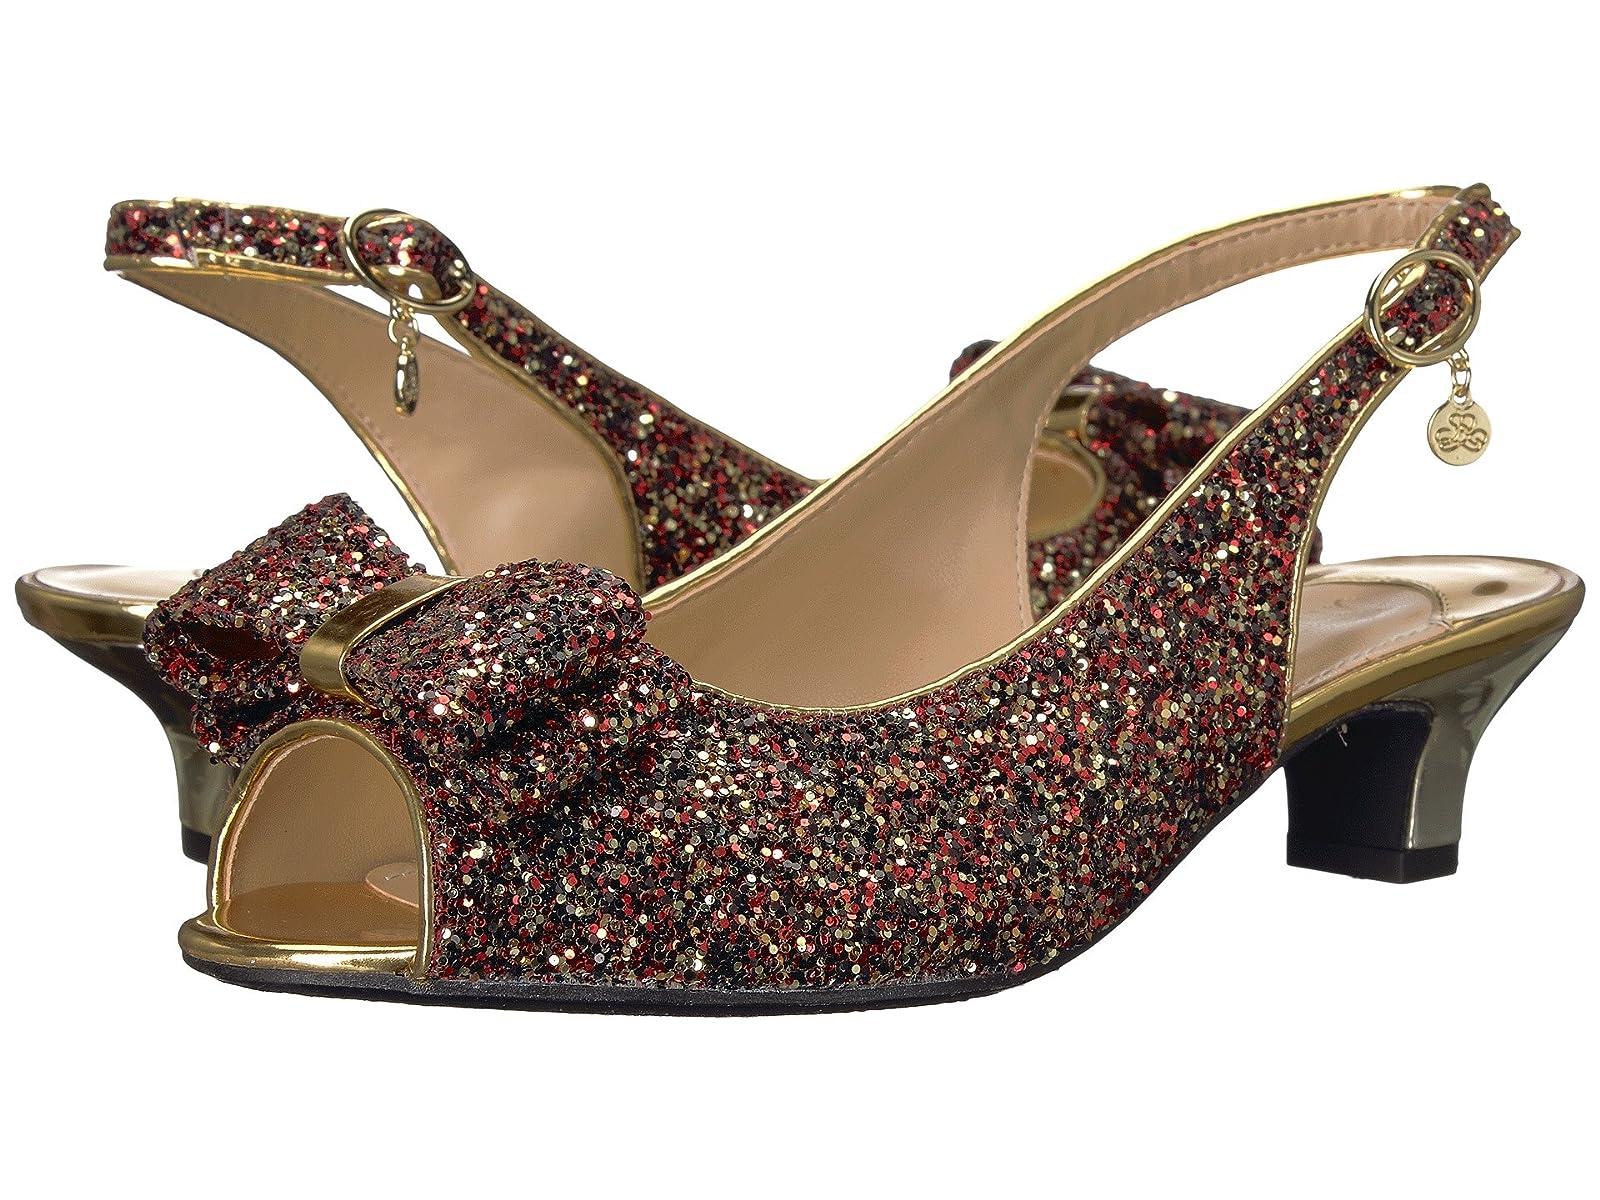 J. Renee LandanCheap and distinctive eye-catching shoes